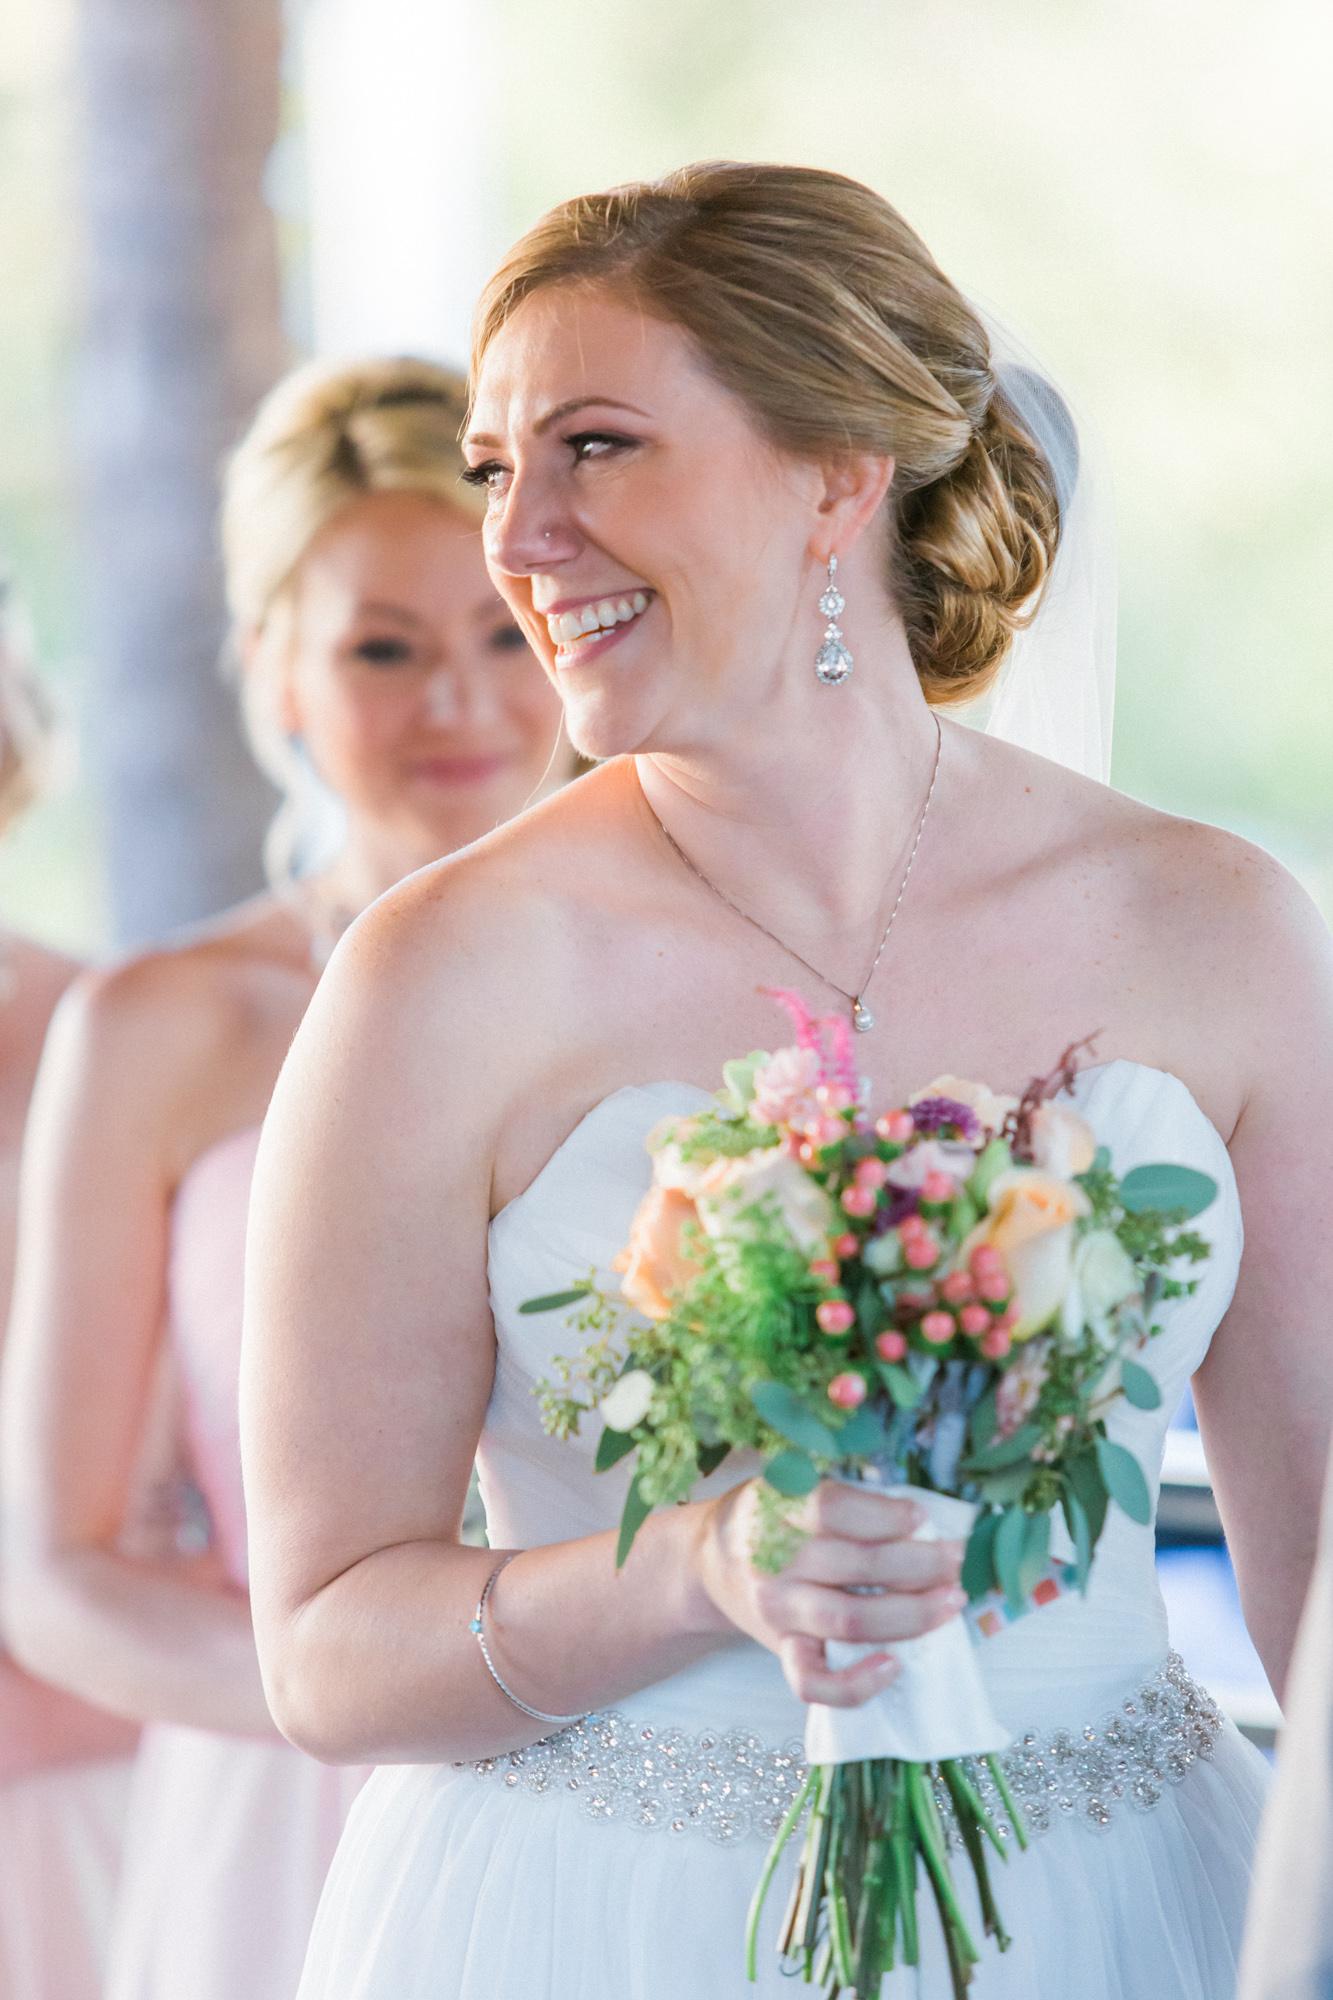 Winter Park Farmer's Market Wedding- Michael & Megan Fine Art Wedding Purple echeveria eucalyptus rose florals10.jpg